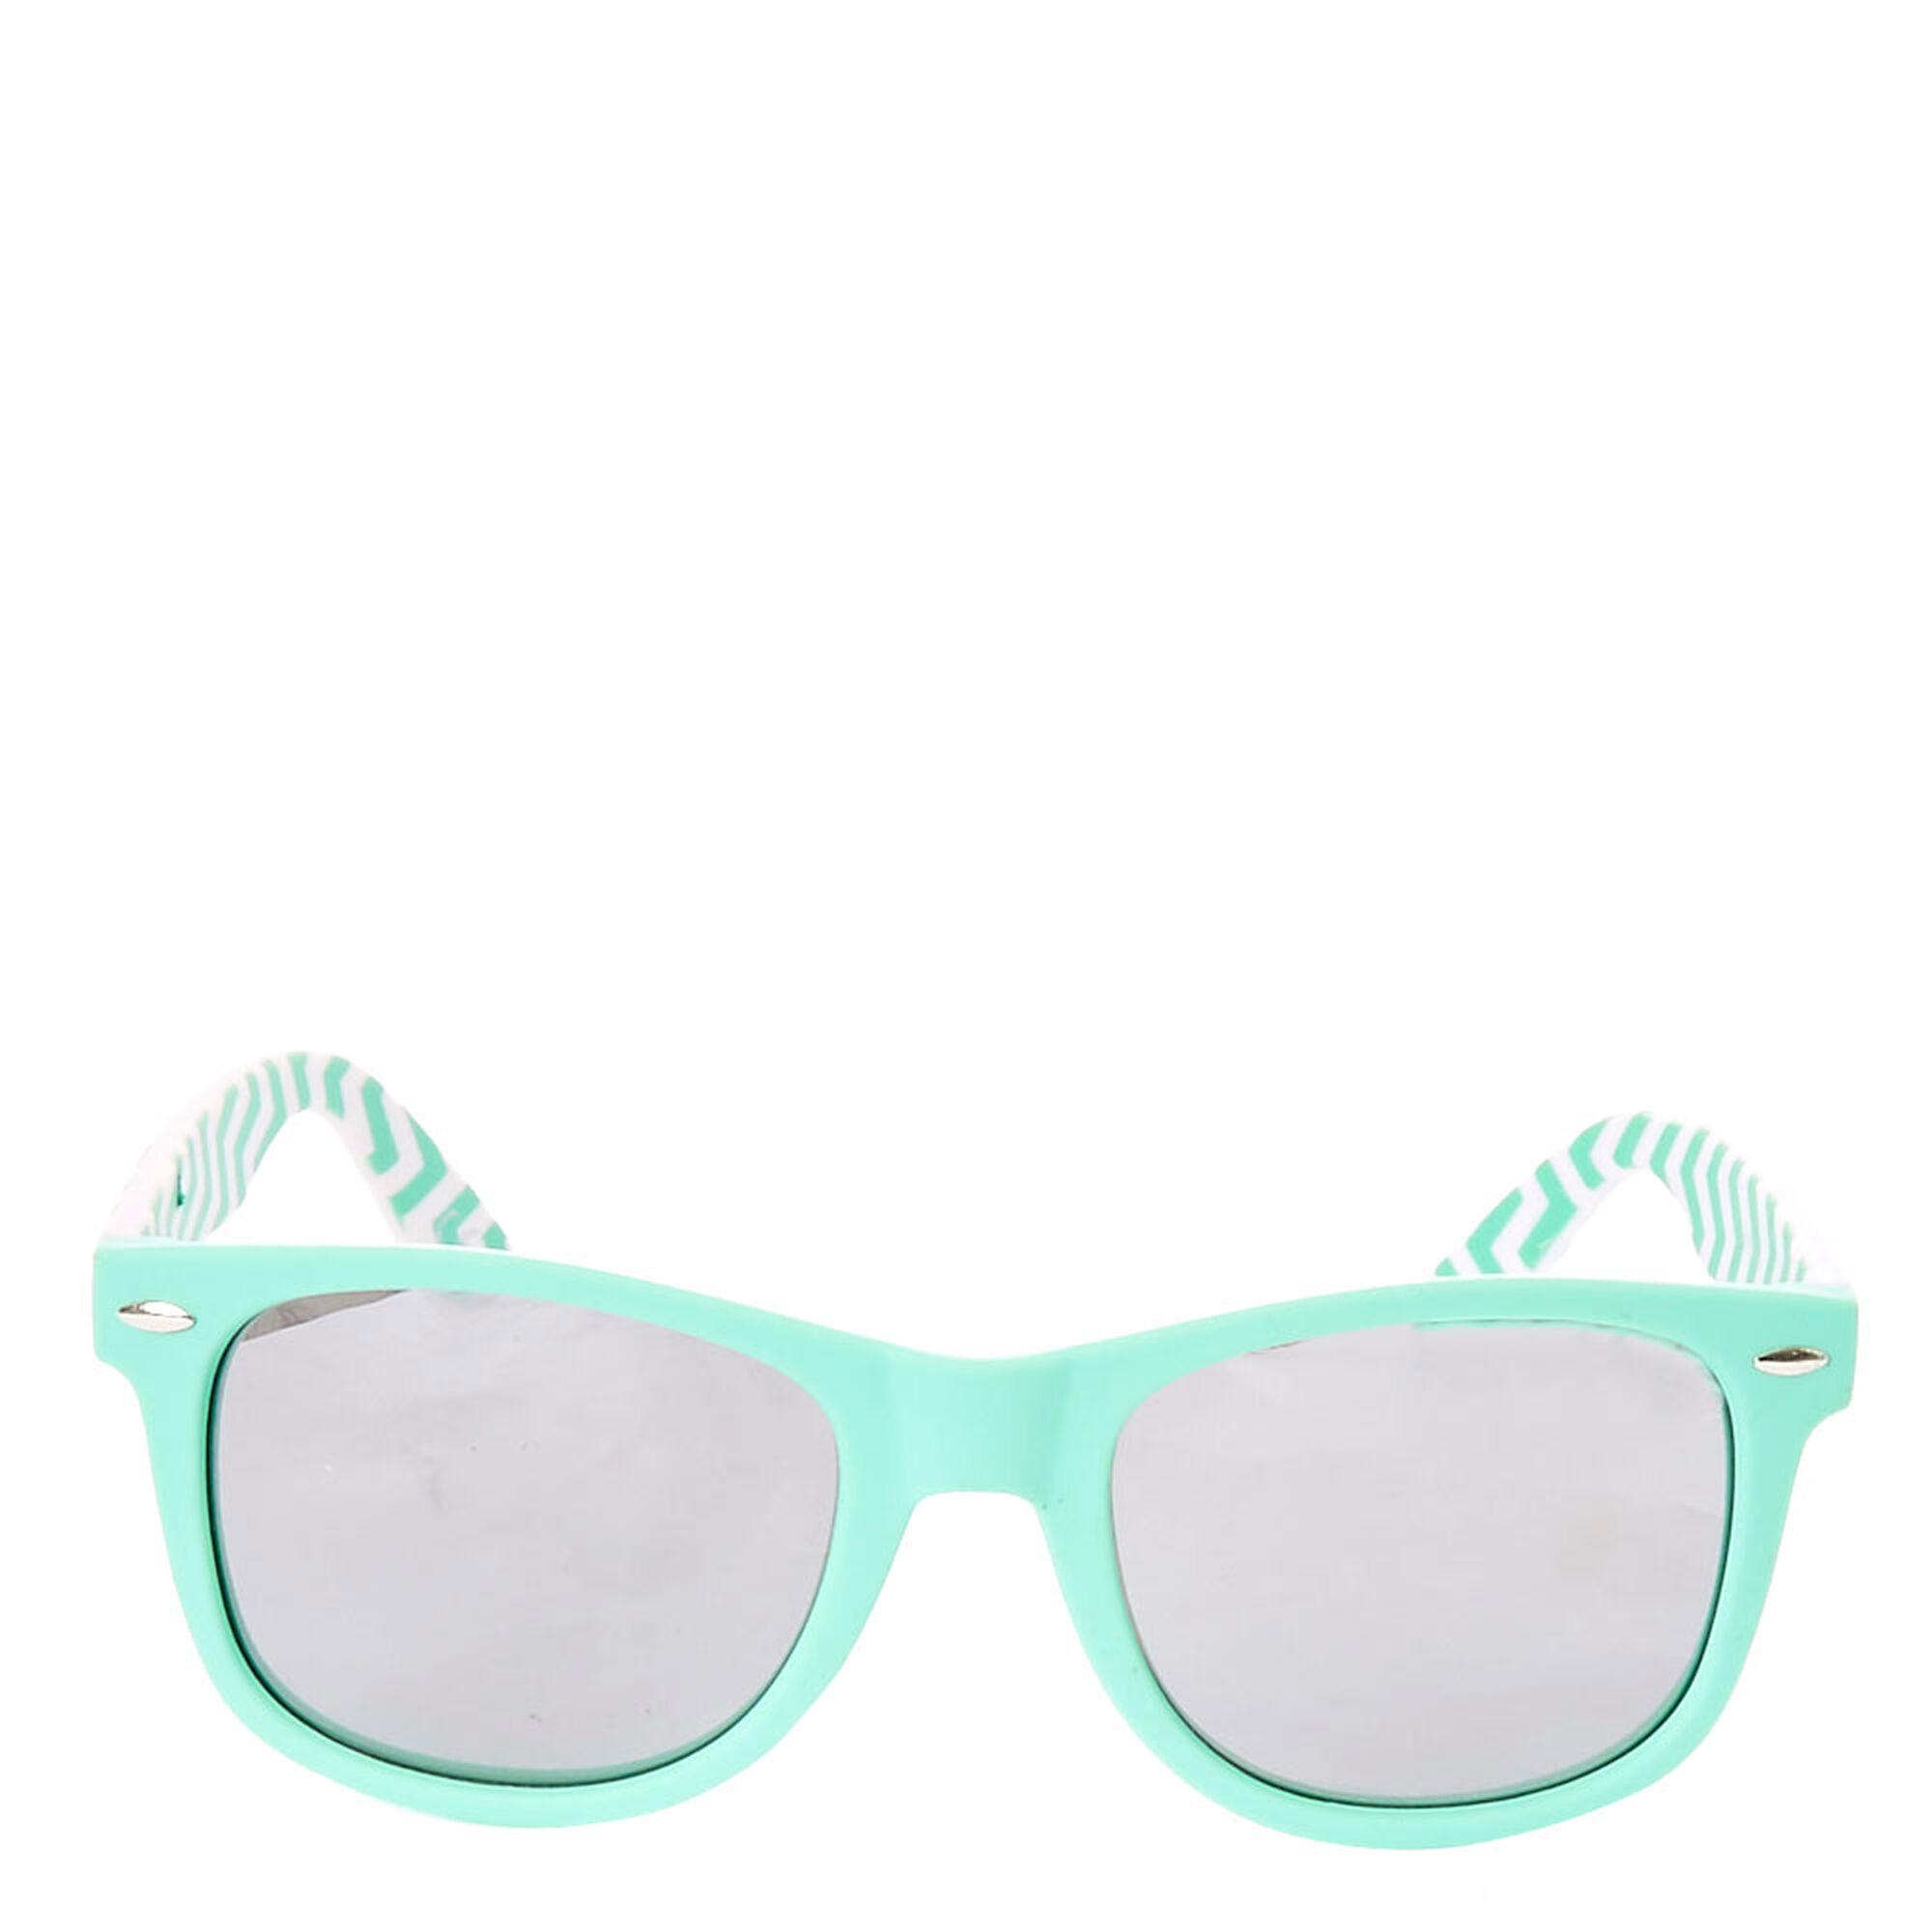 8d38b6b4d18a ... Chevron Retro Sunglasses - Mint